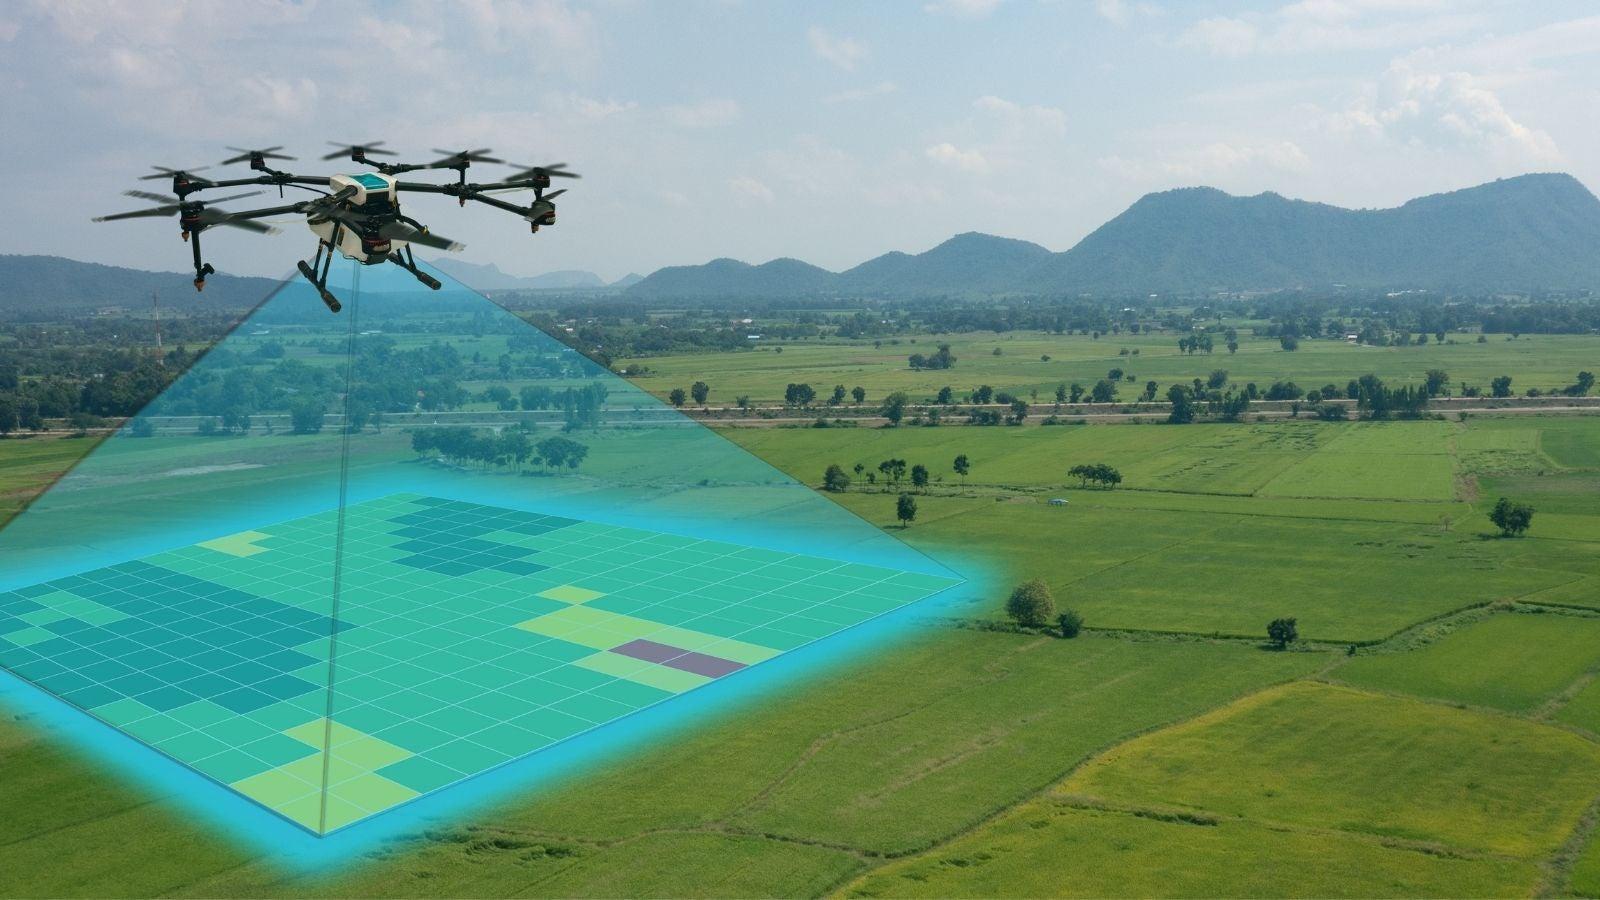 Drones of the future